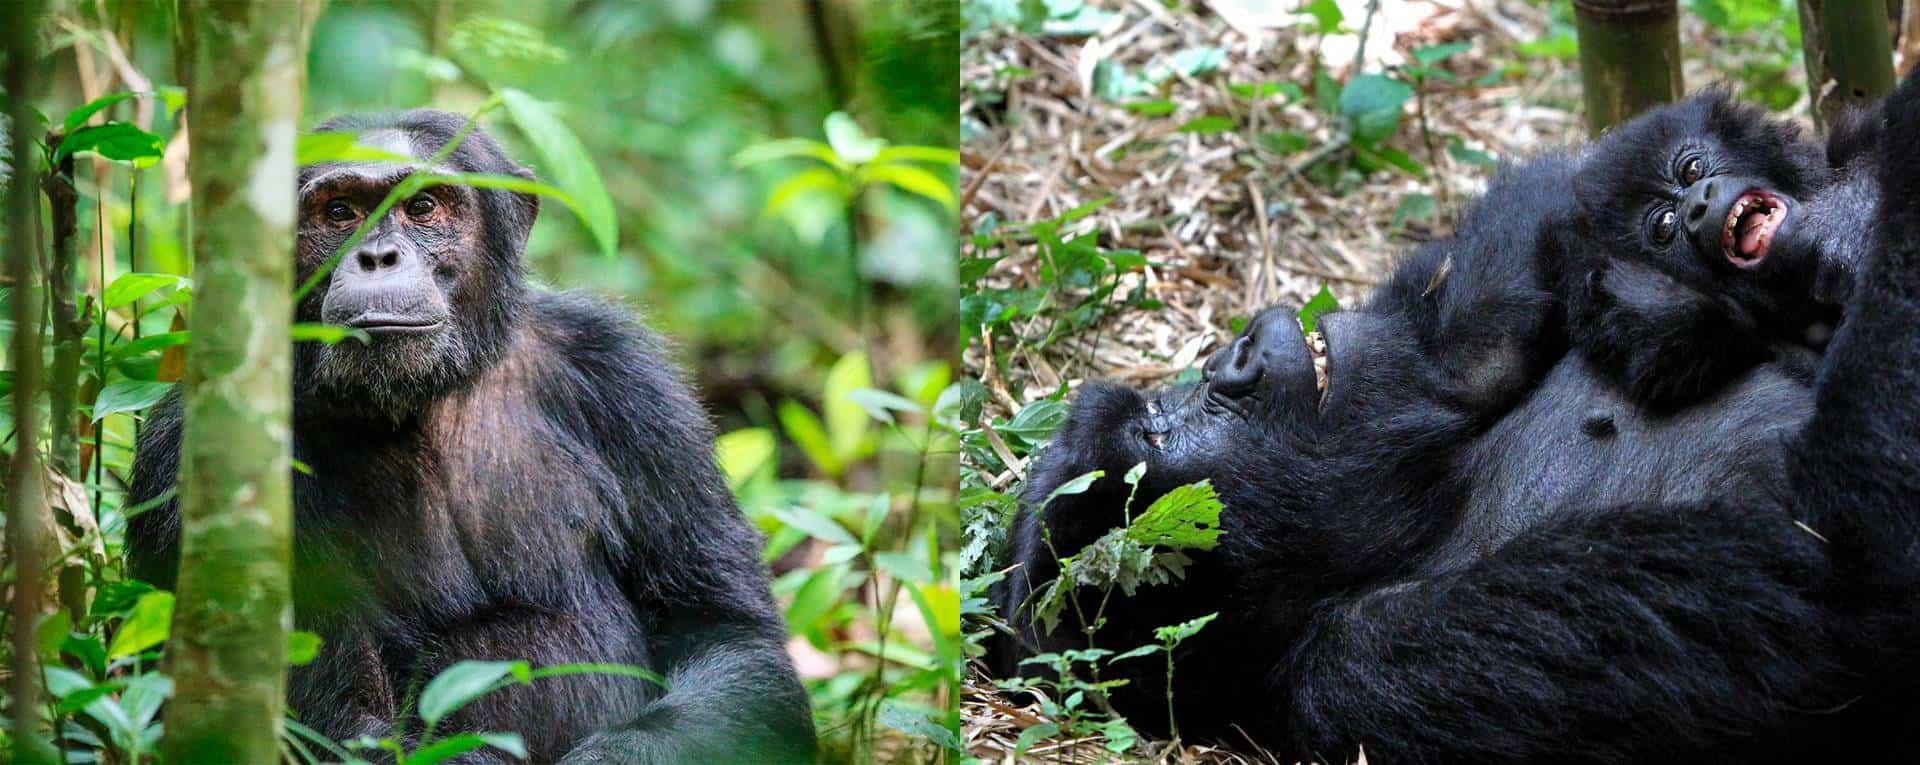 Gorilla, Chimpanzee & Primate Safaris Trip Planning Guide For Uganda